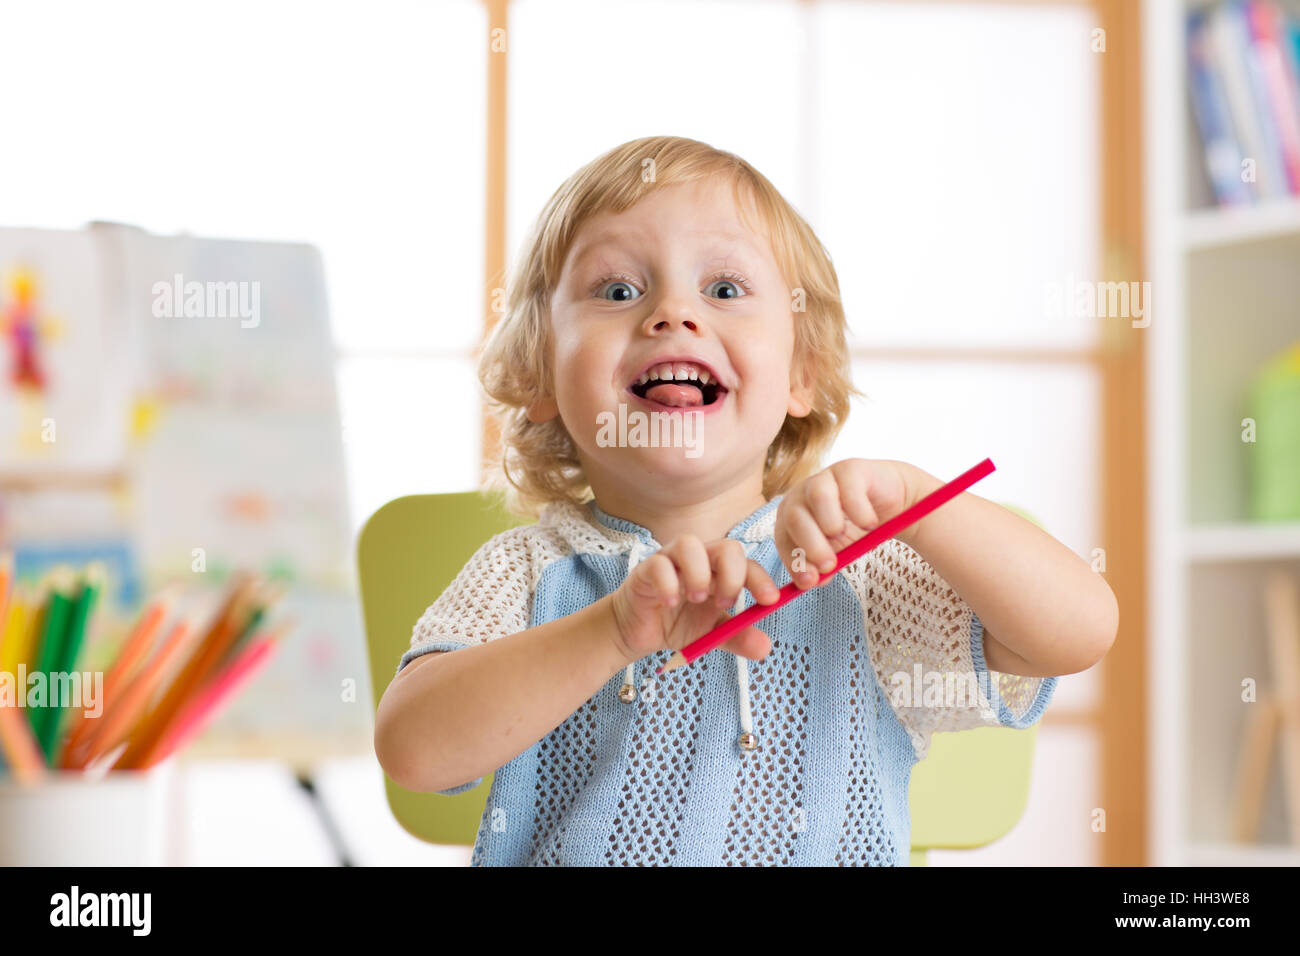 Portrait of a smiling preschool kid boy drawing - Stock Image